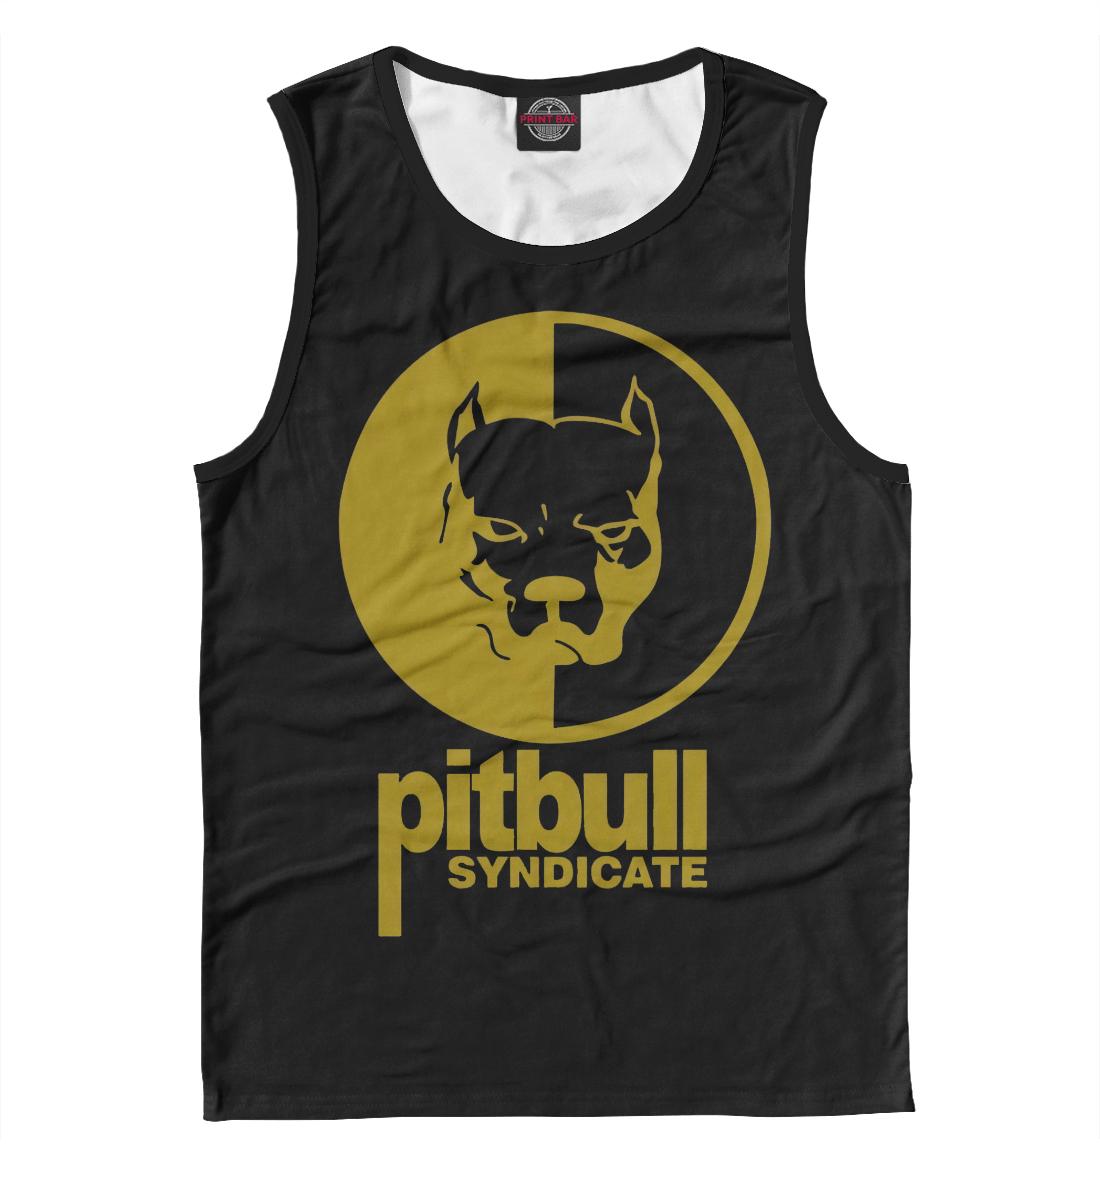 Купить Pitbull Syndicate, Printbar, Майки, NDP-167300-may-2